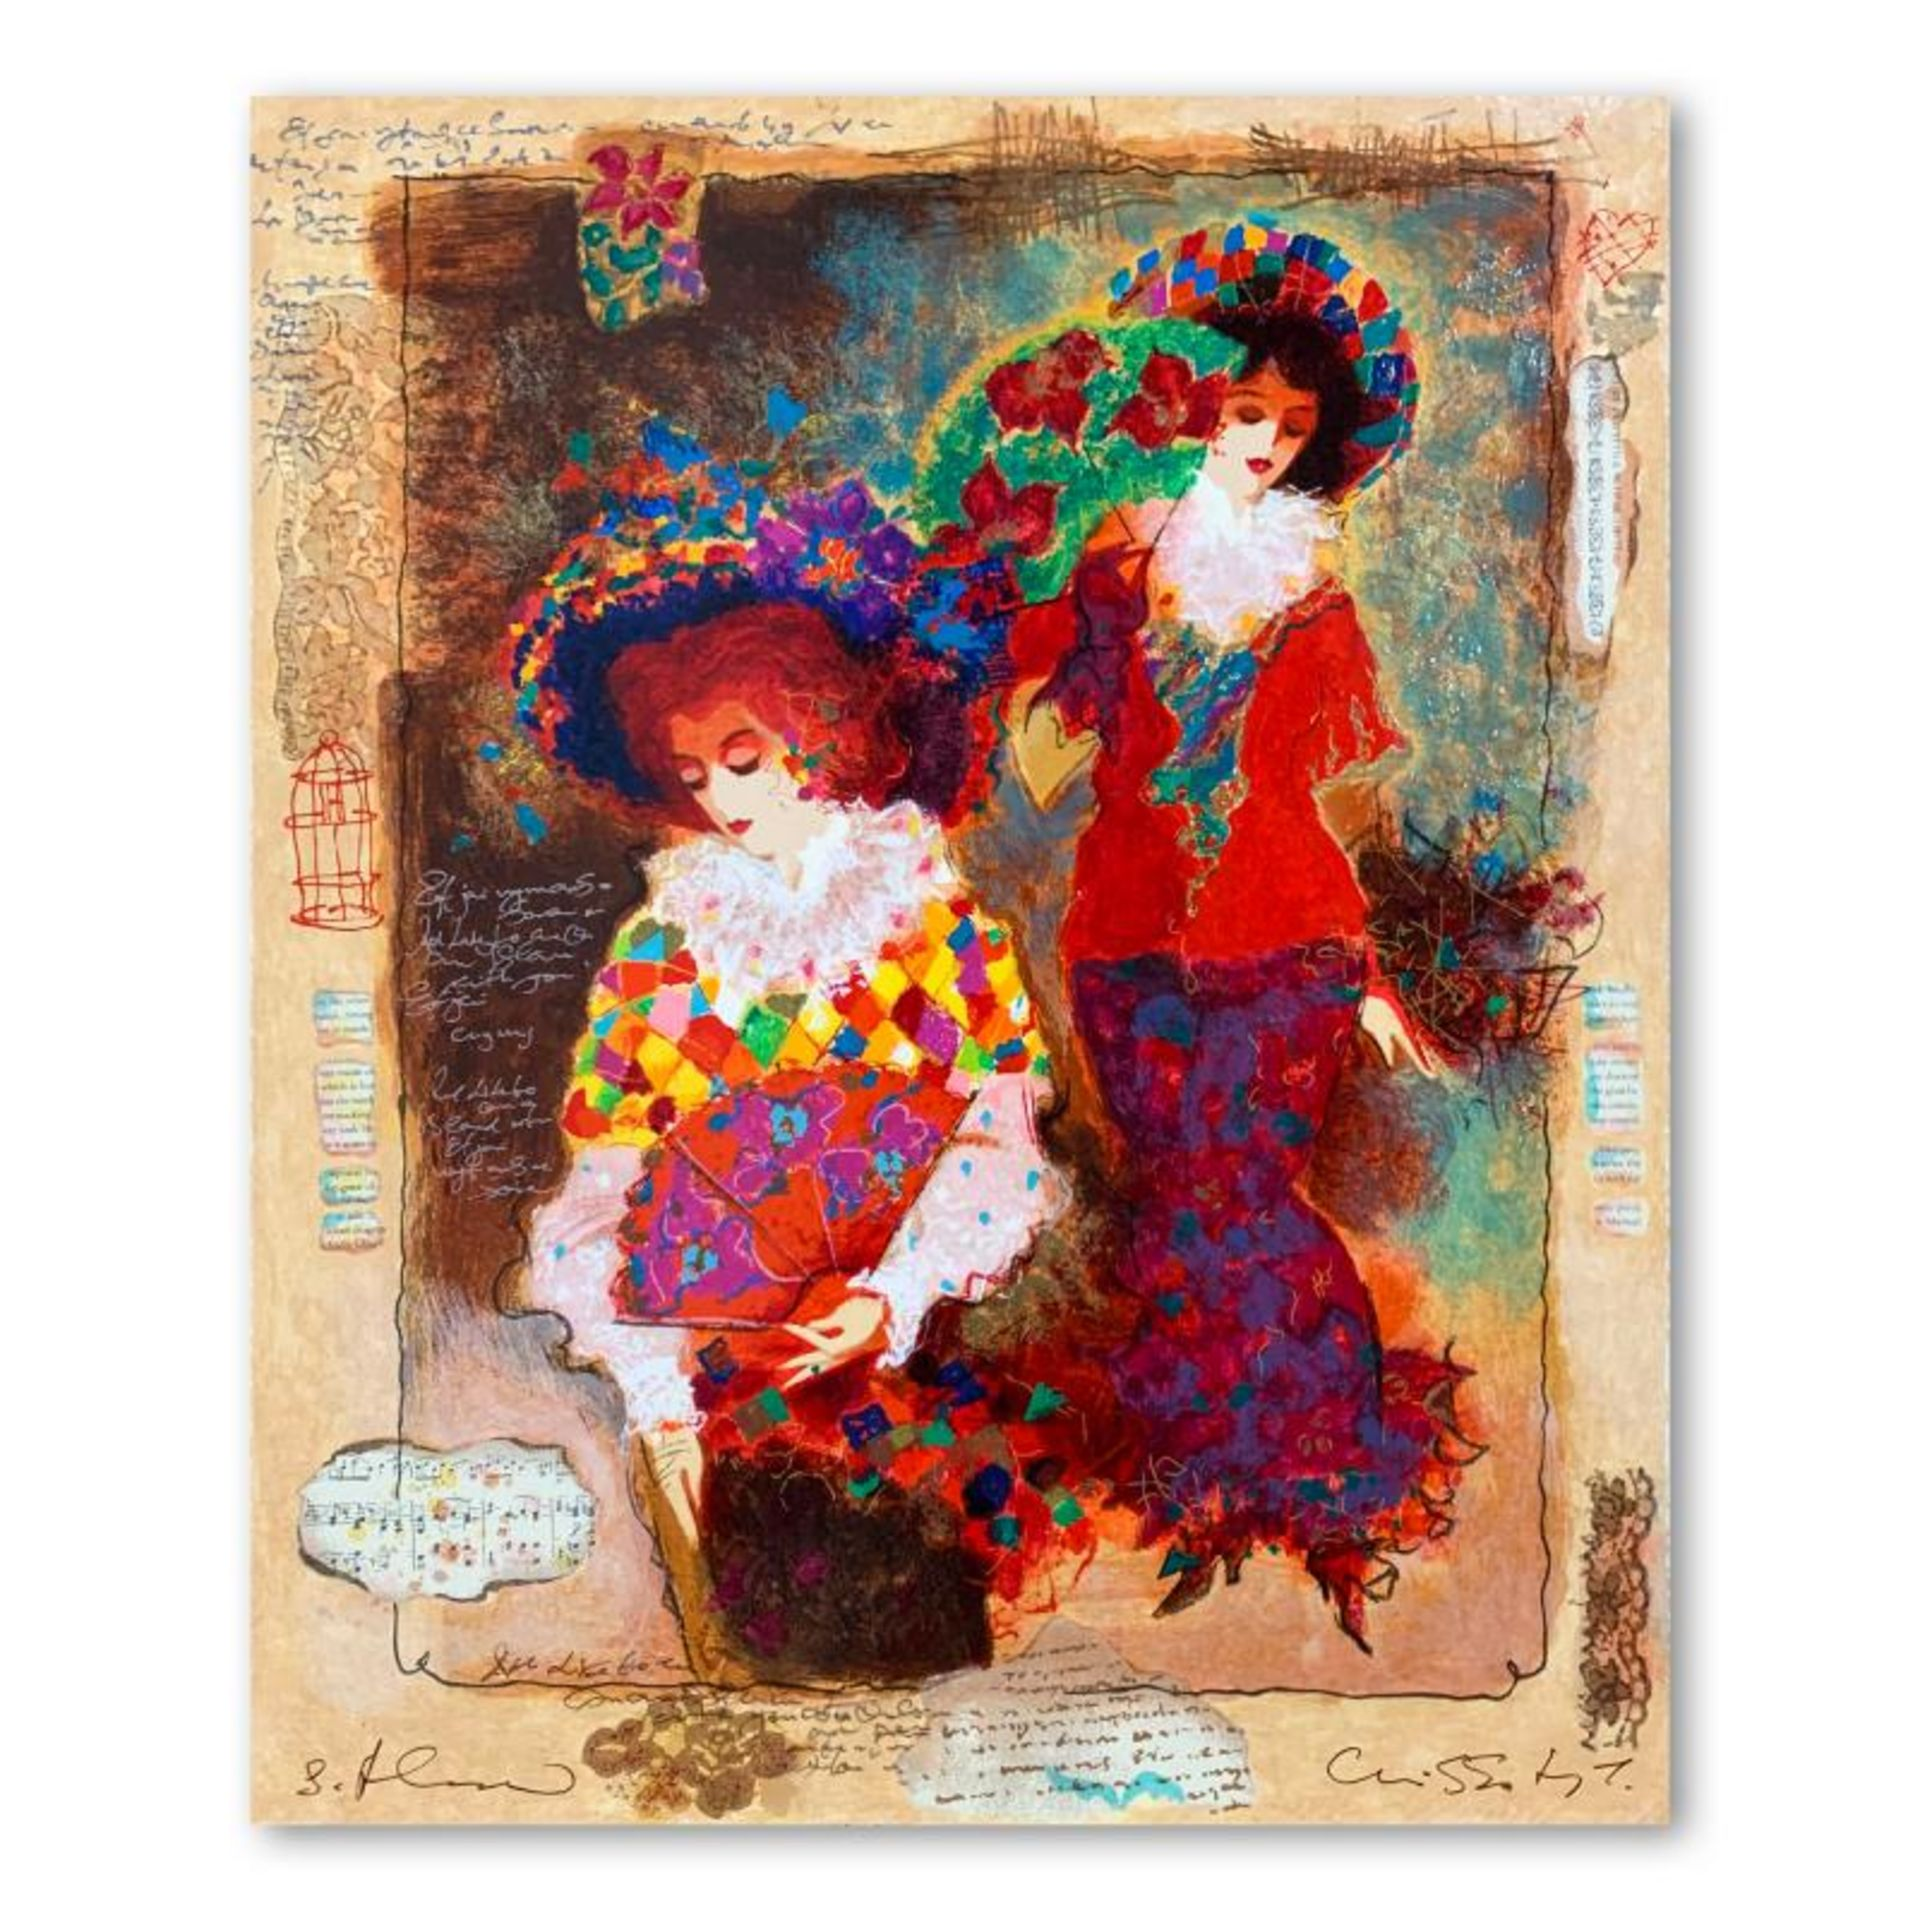 Elegant Women by Alexander & Wissotzky